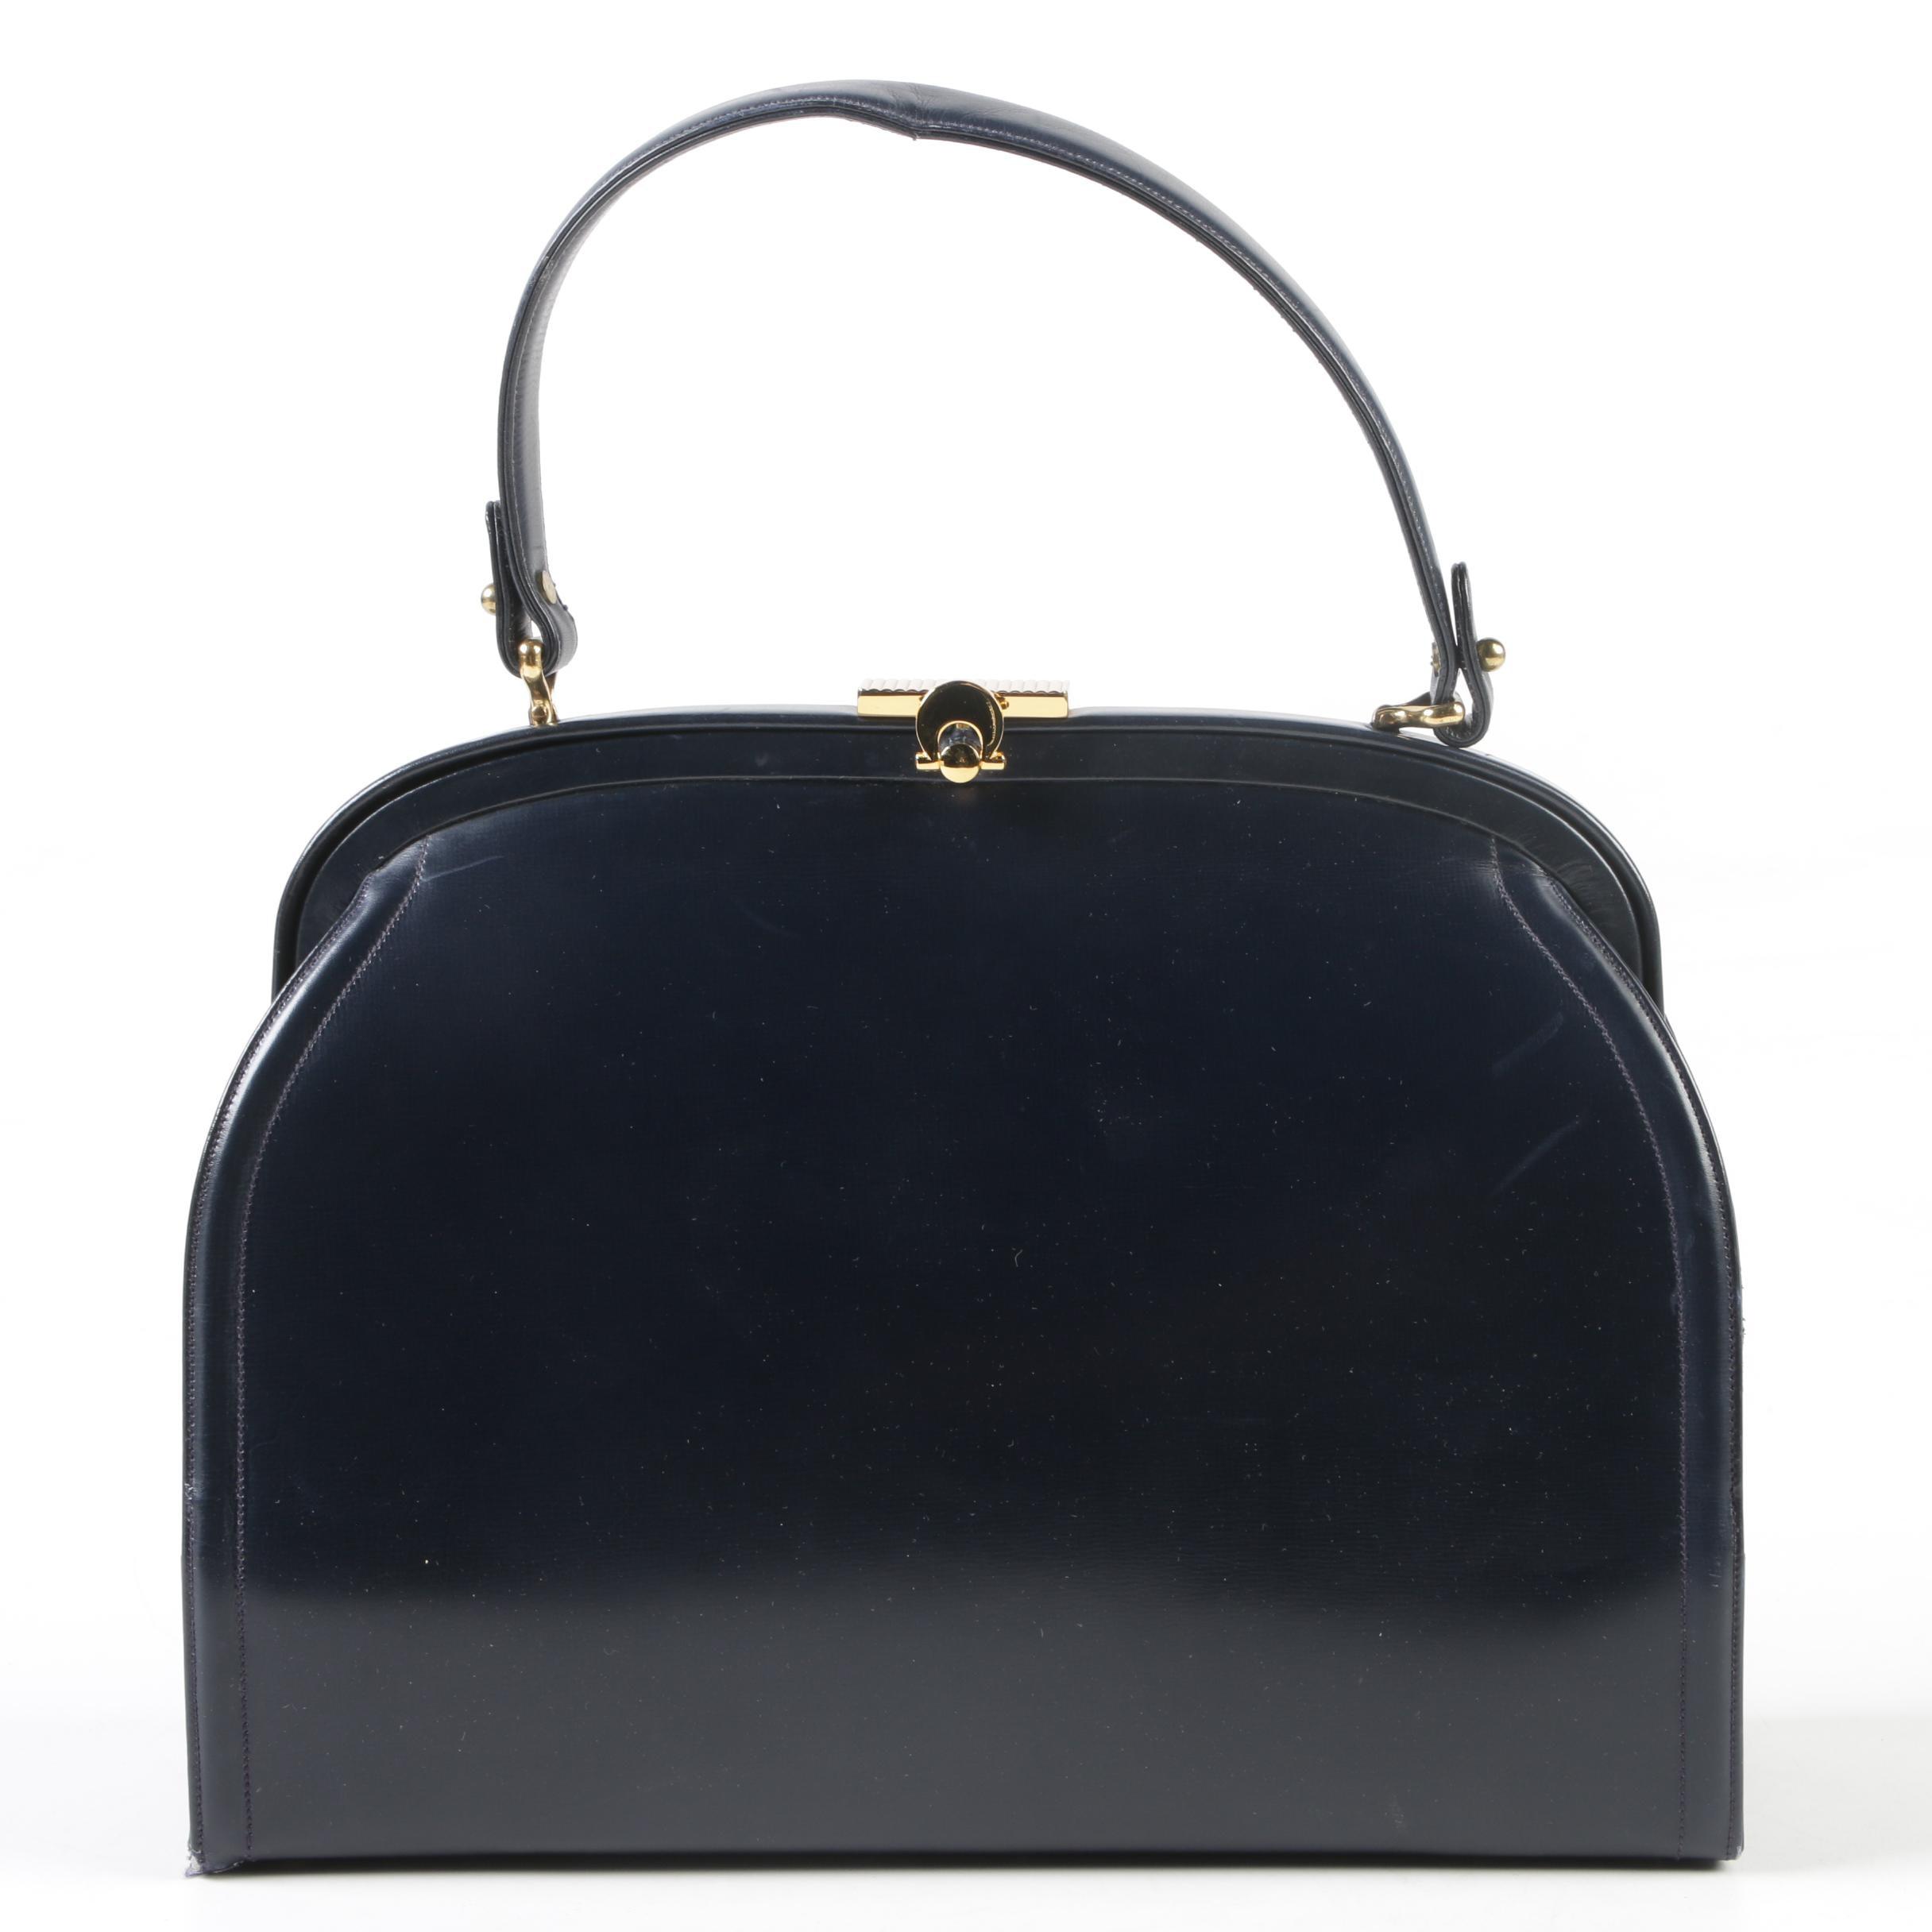 Prestige Midnight Blue Leather Dome Bag with Gold Tone Hardware, Circa 1960